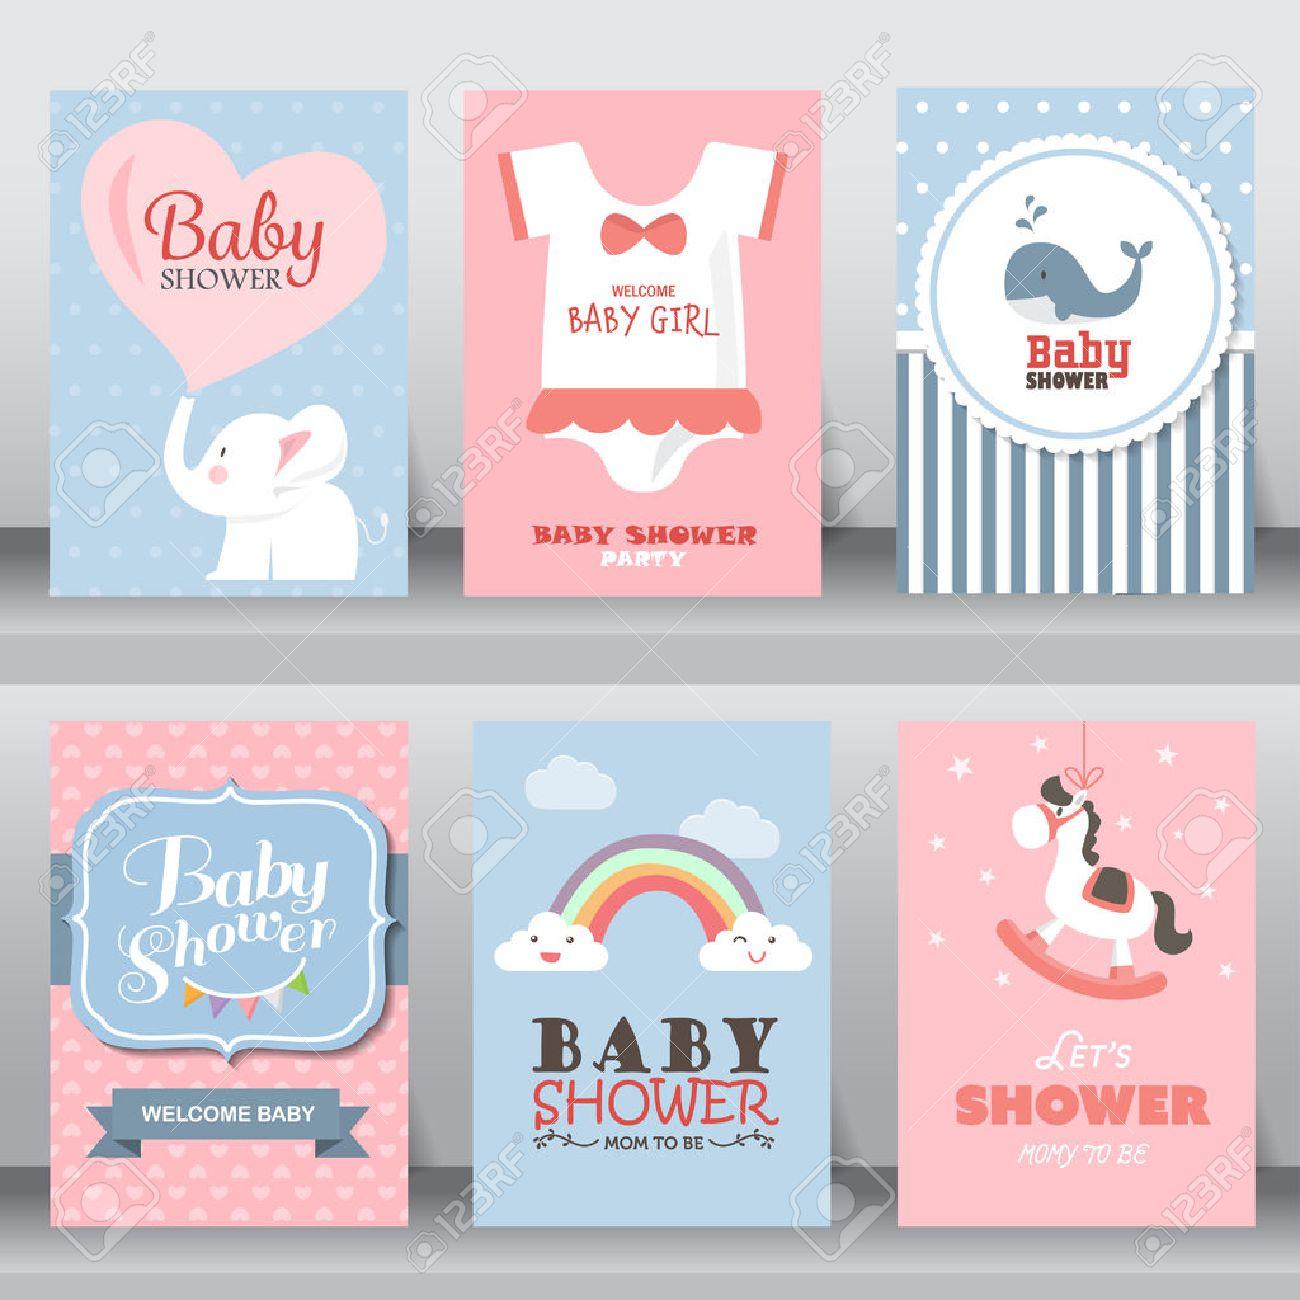 happy birthday, holiday, baby shower celebration greeting and invitation card. - 53611536